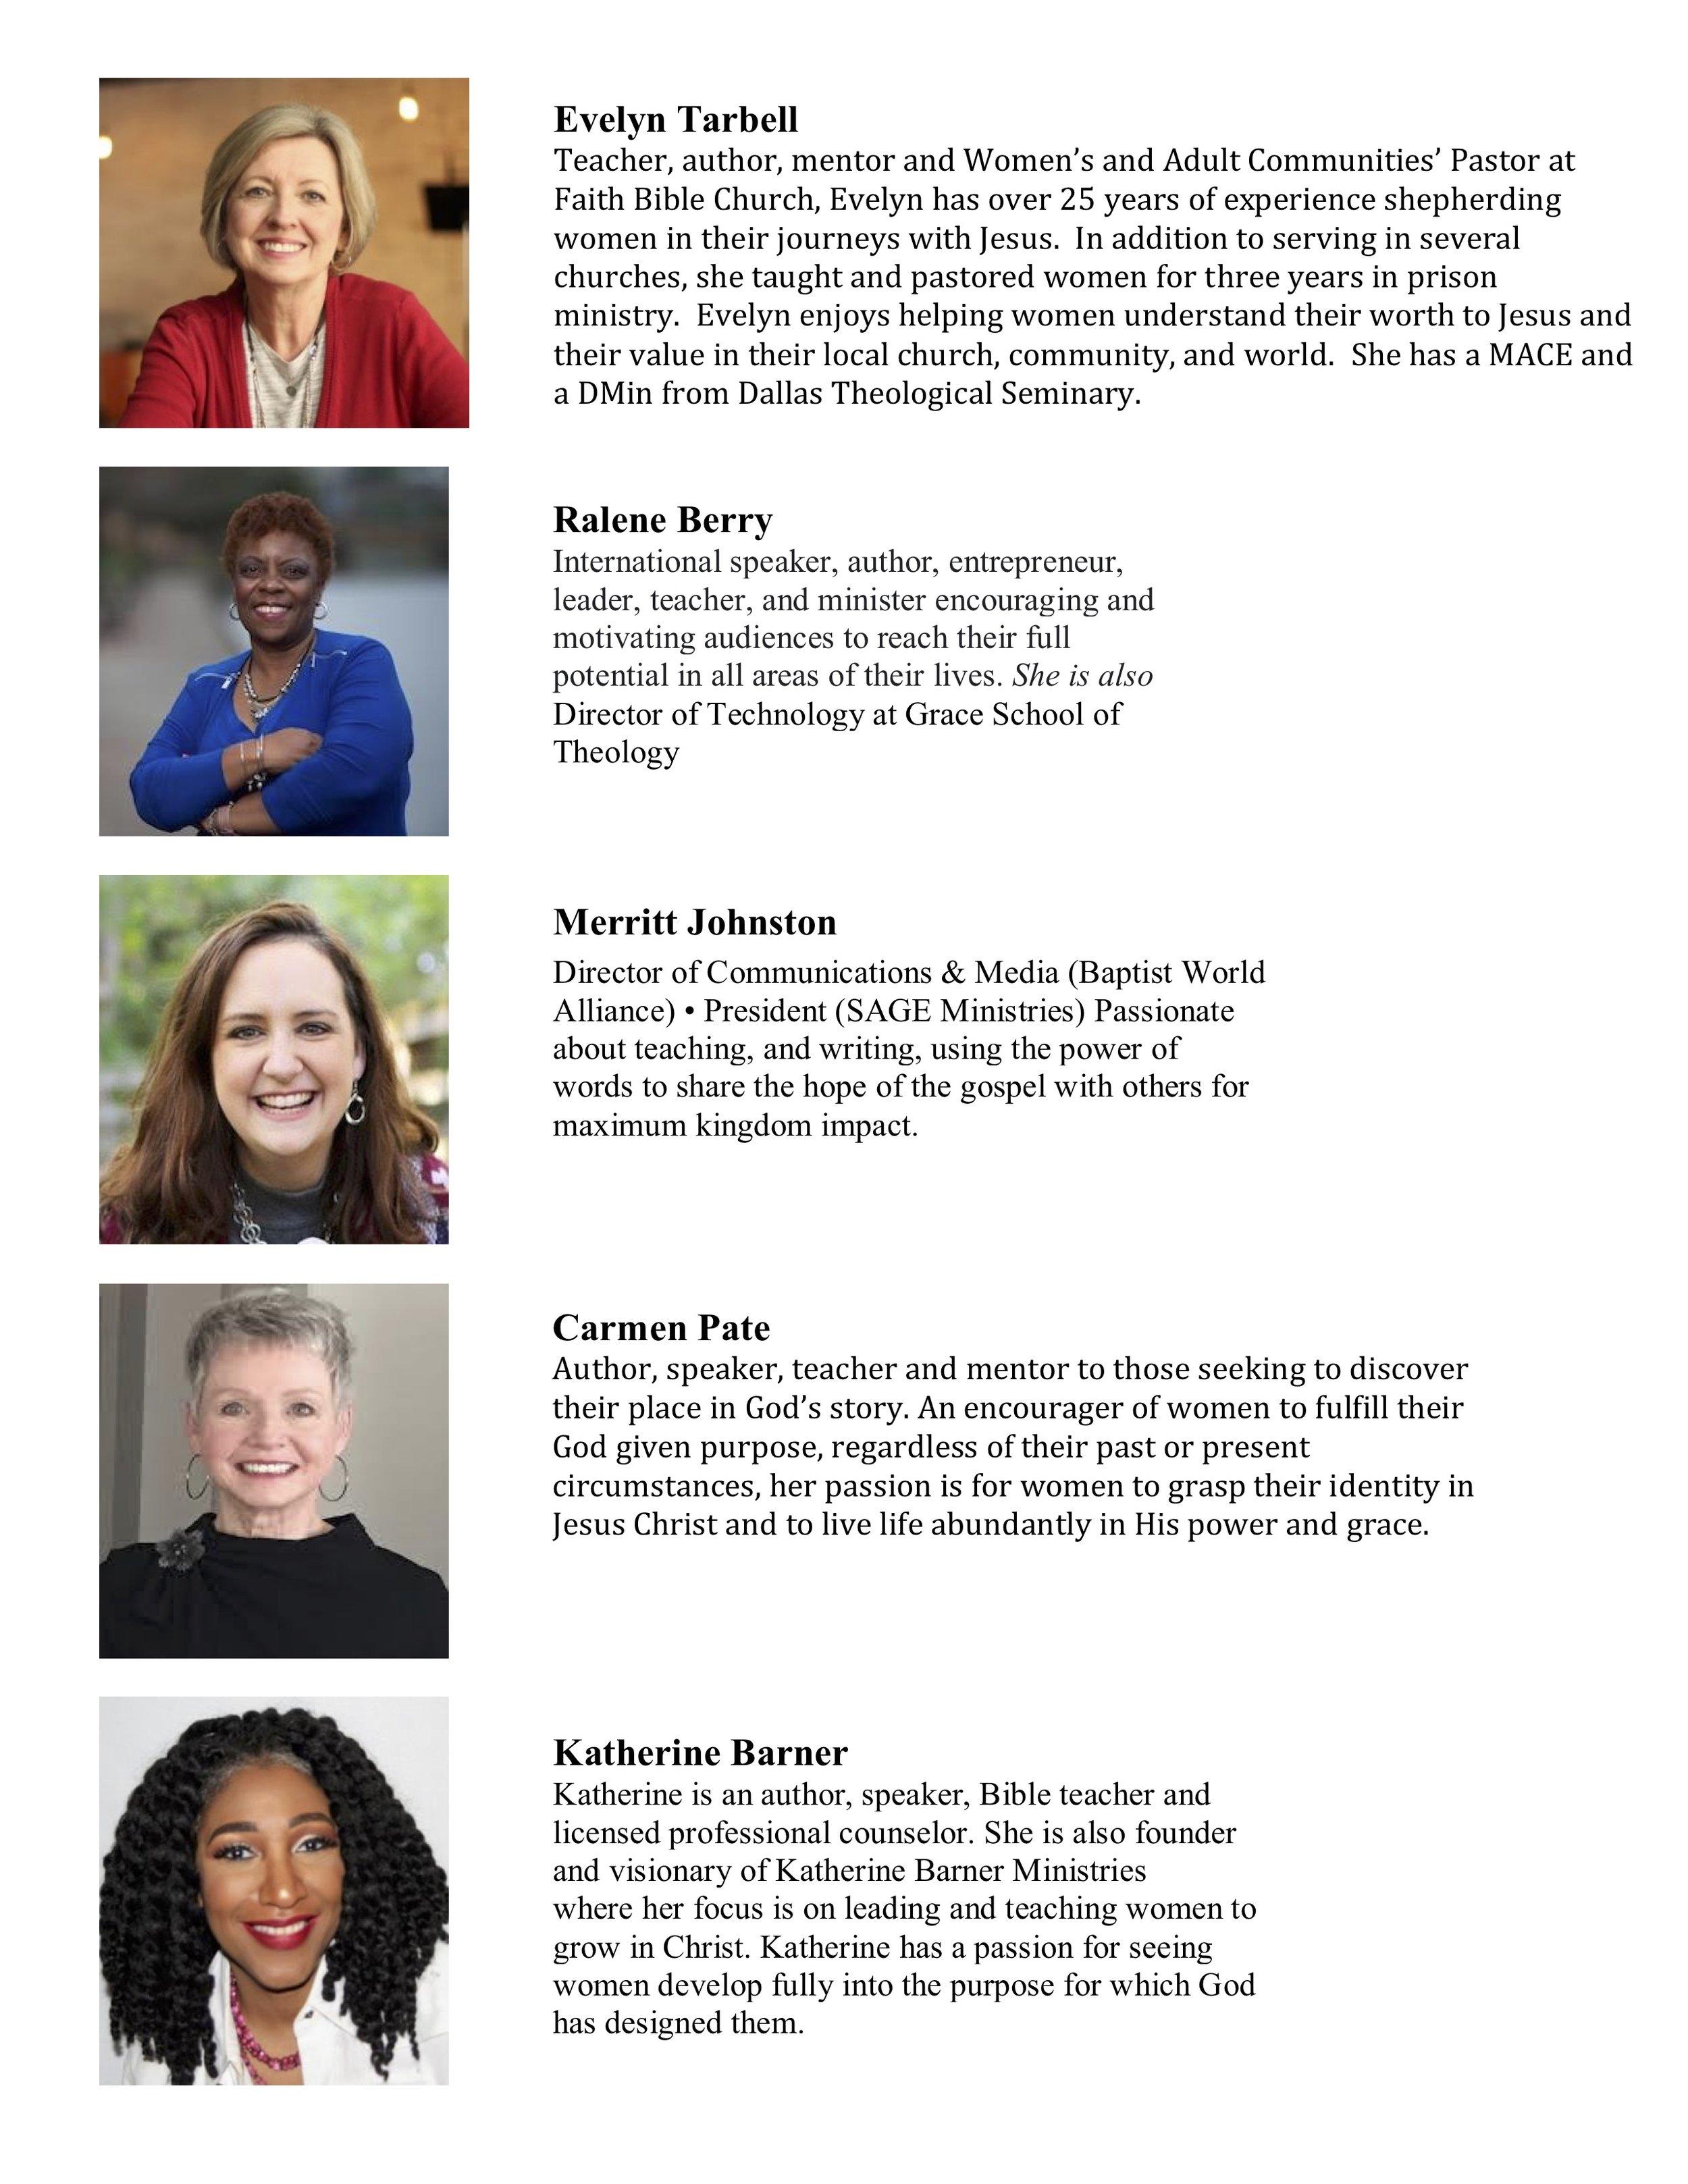 women's_panel_ bios1.jpg